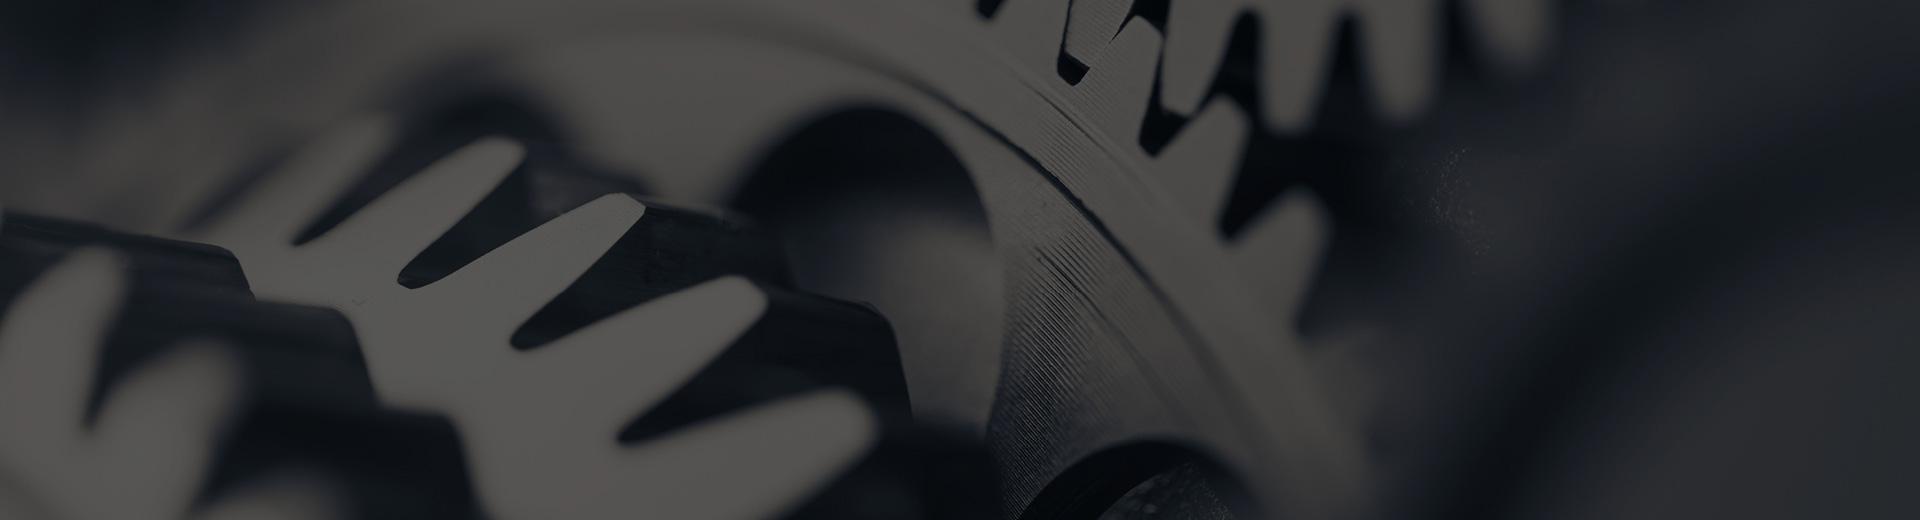 https://www.enolgas.com/sites/default/files/revslider/image/enolgas-immagini-slider-05.jpg